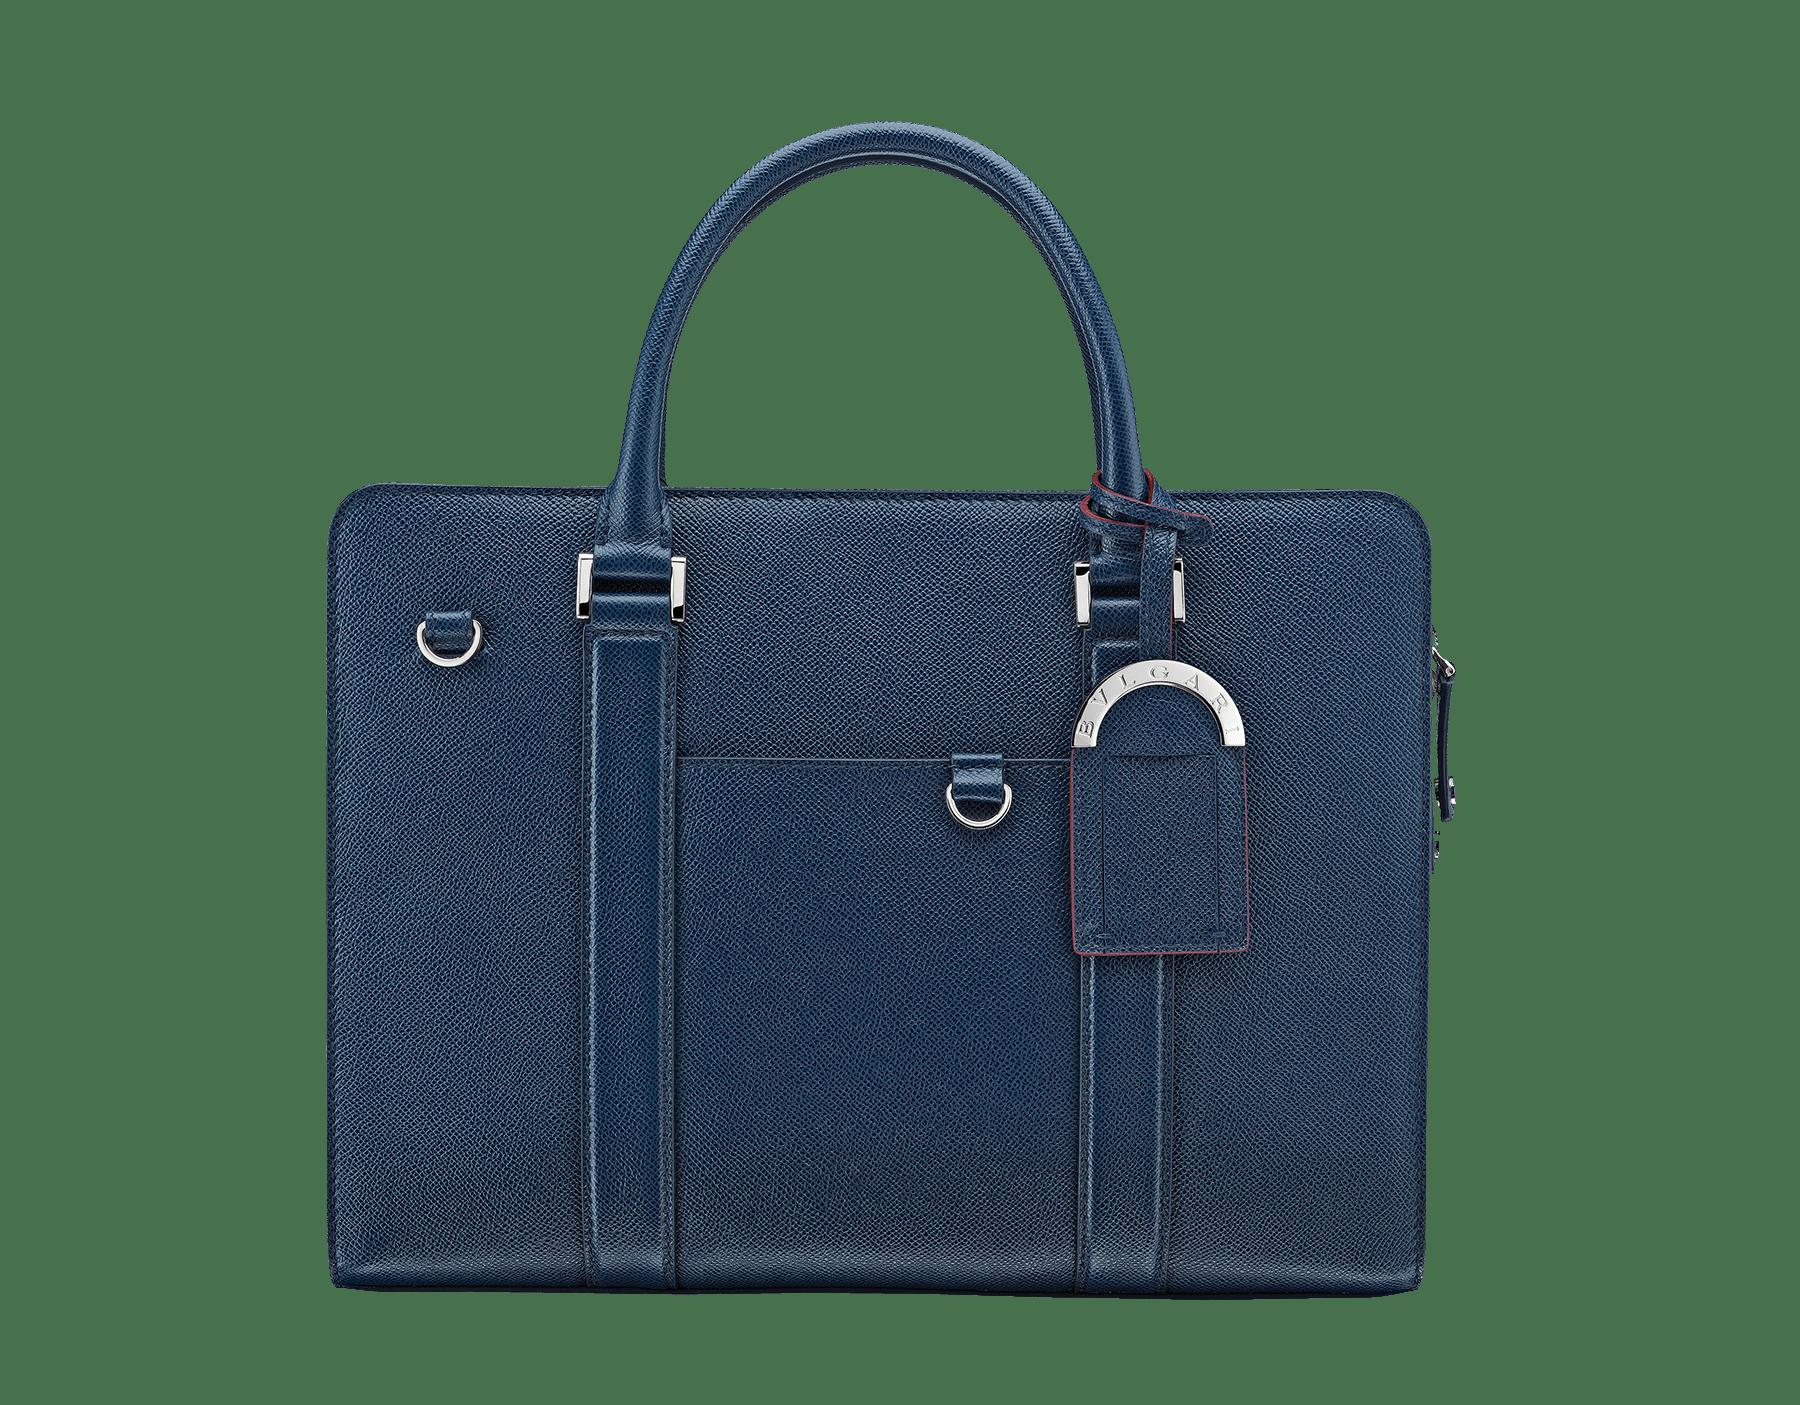 """BVLGARI BVLGARI"" zipped briefcase in mimetic jade grain calf leather with brass palladium plated hardware. BBM-001-0655S image 1"